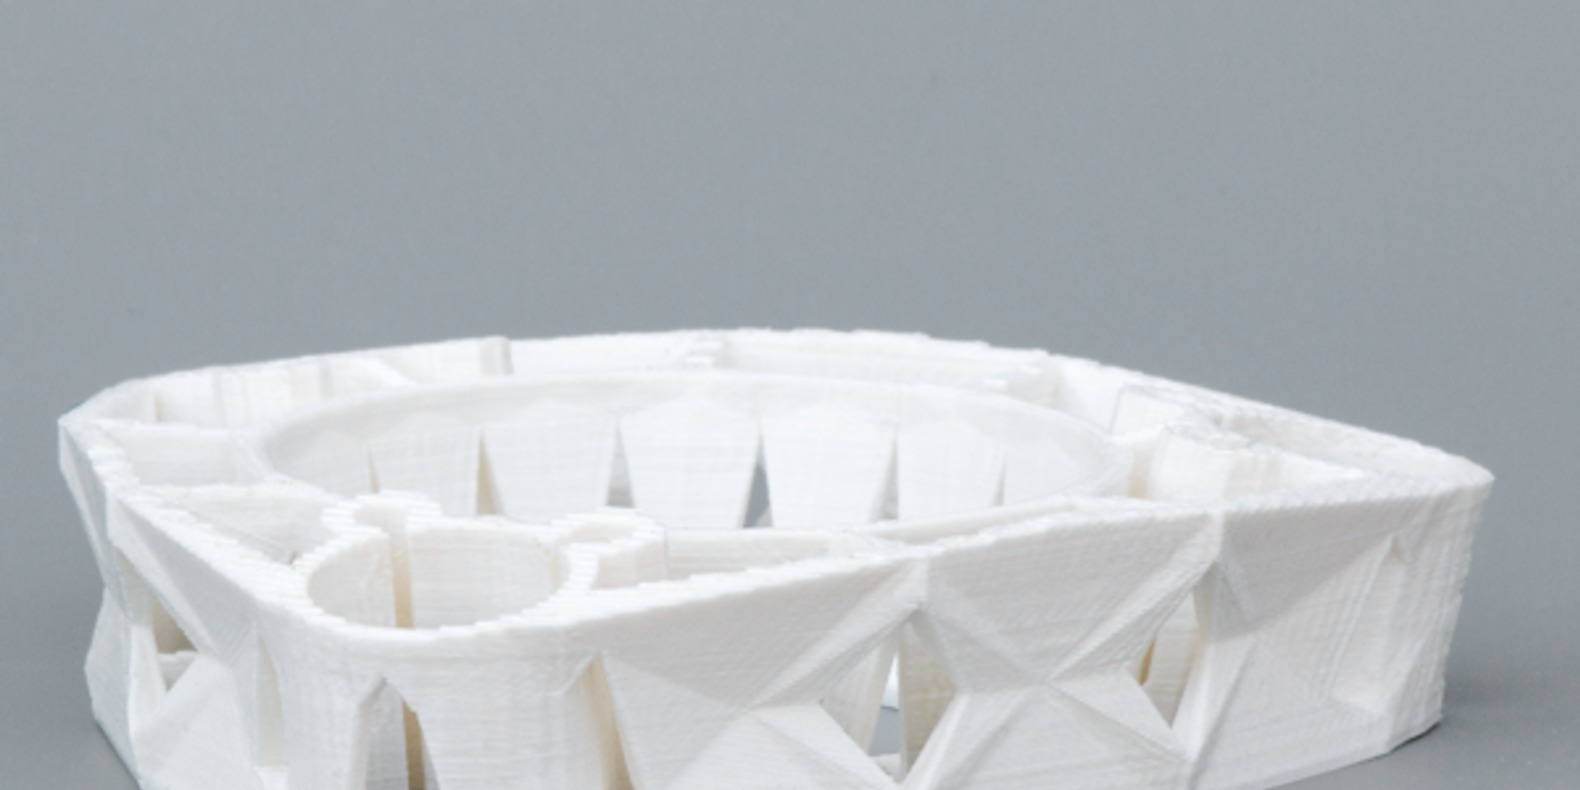 besenthal_01 besenthal_04 MYO lampe imprimée en 3D lamp 3D printing impression 3D